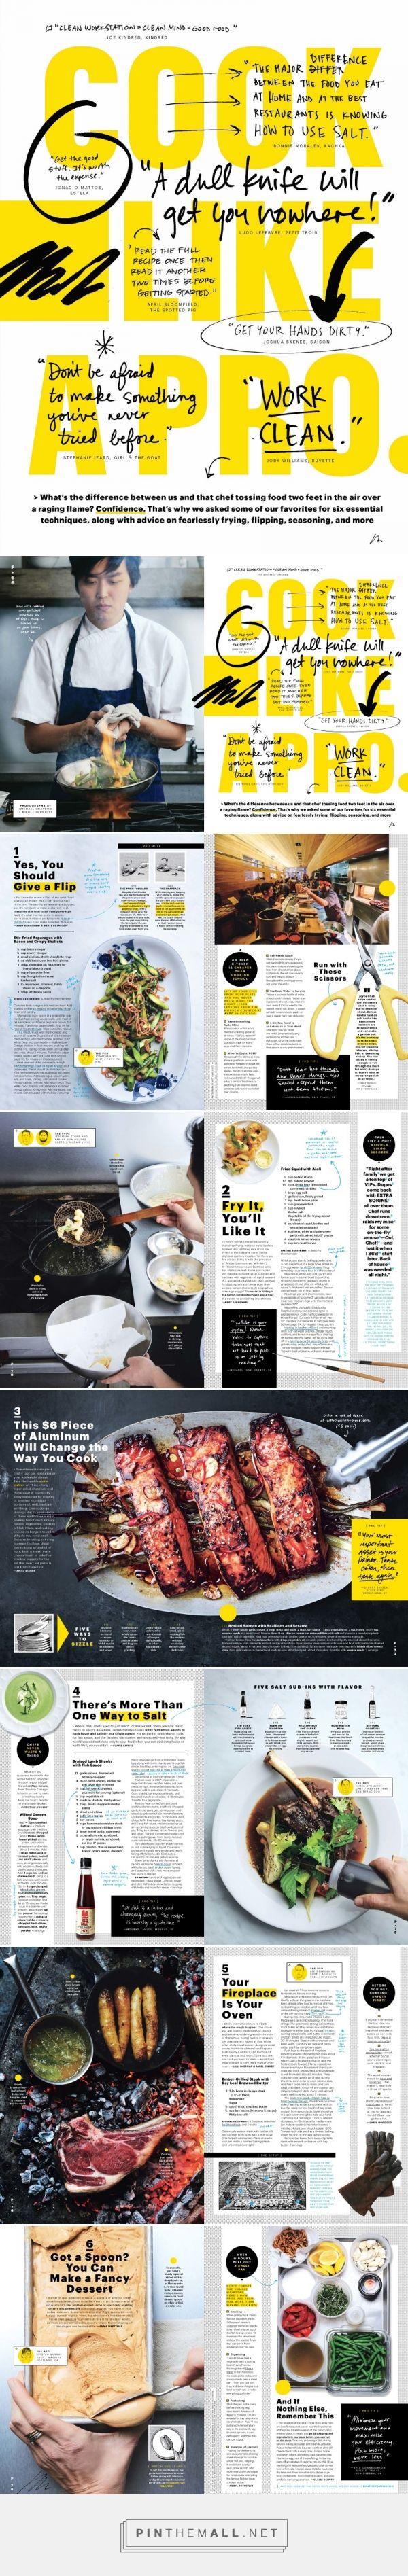 Cook Like A Pro - Alaina Sullivan